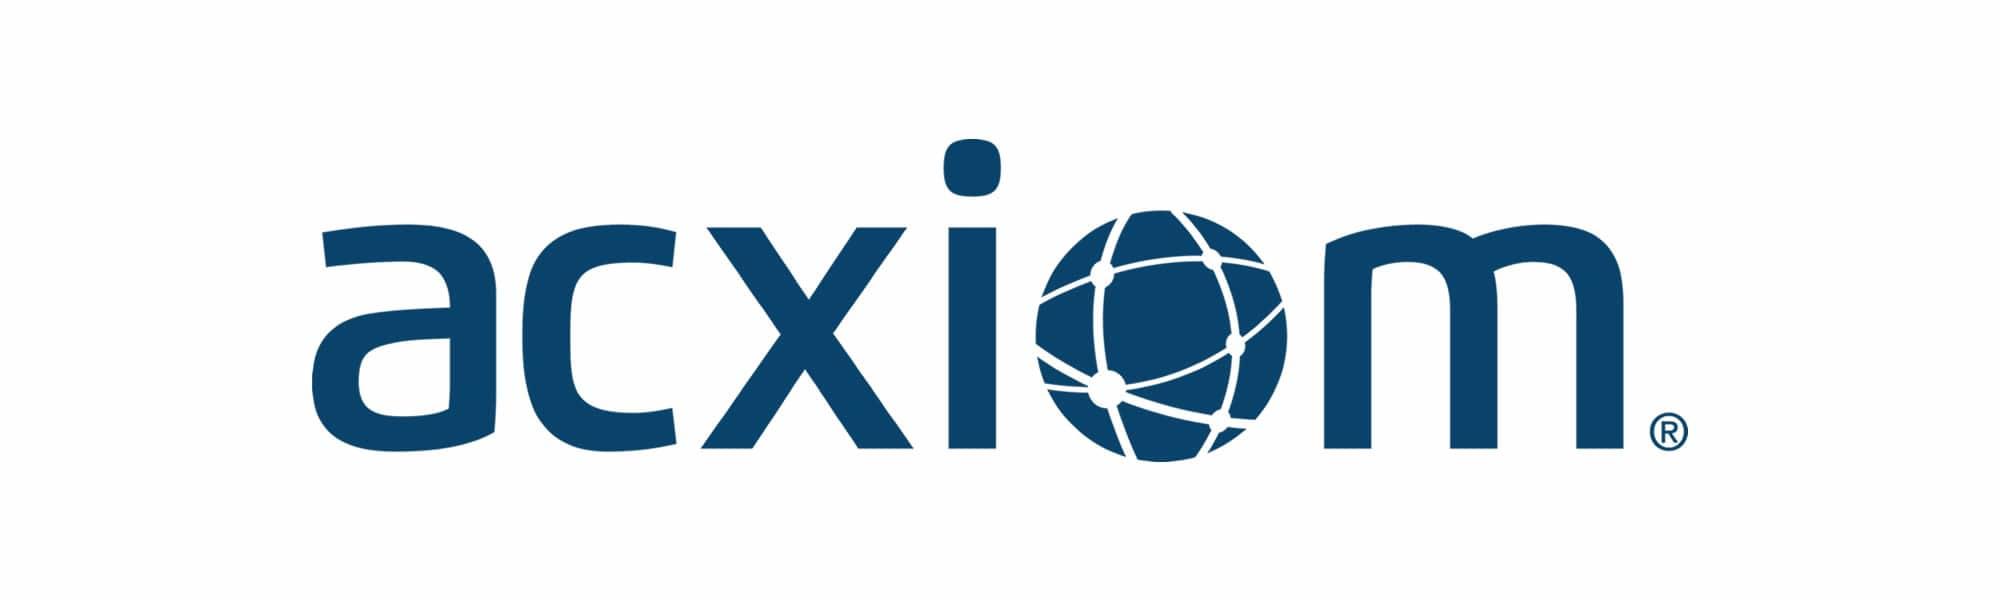 Acxiom Announces New Addressable Media Solutions